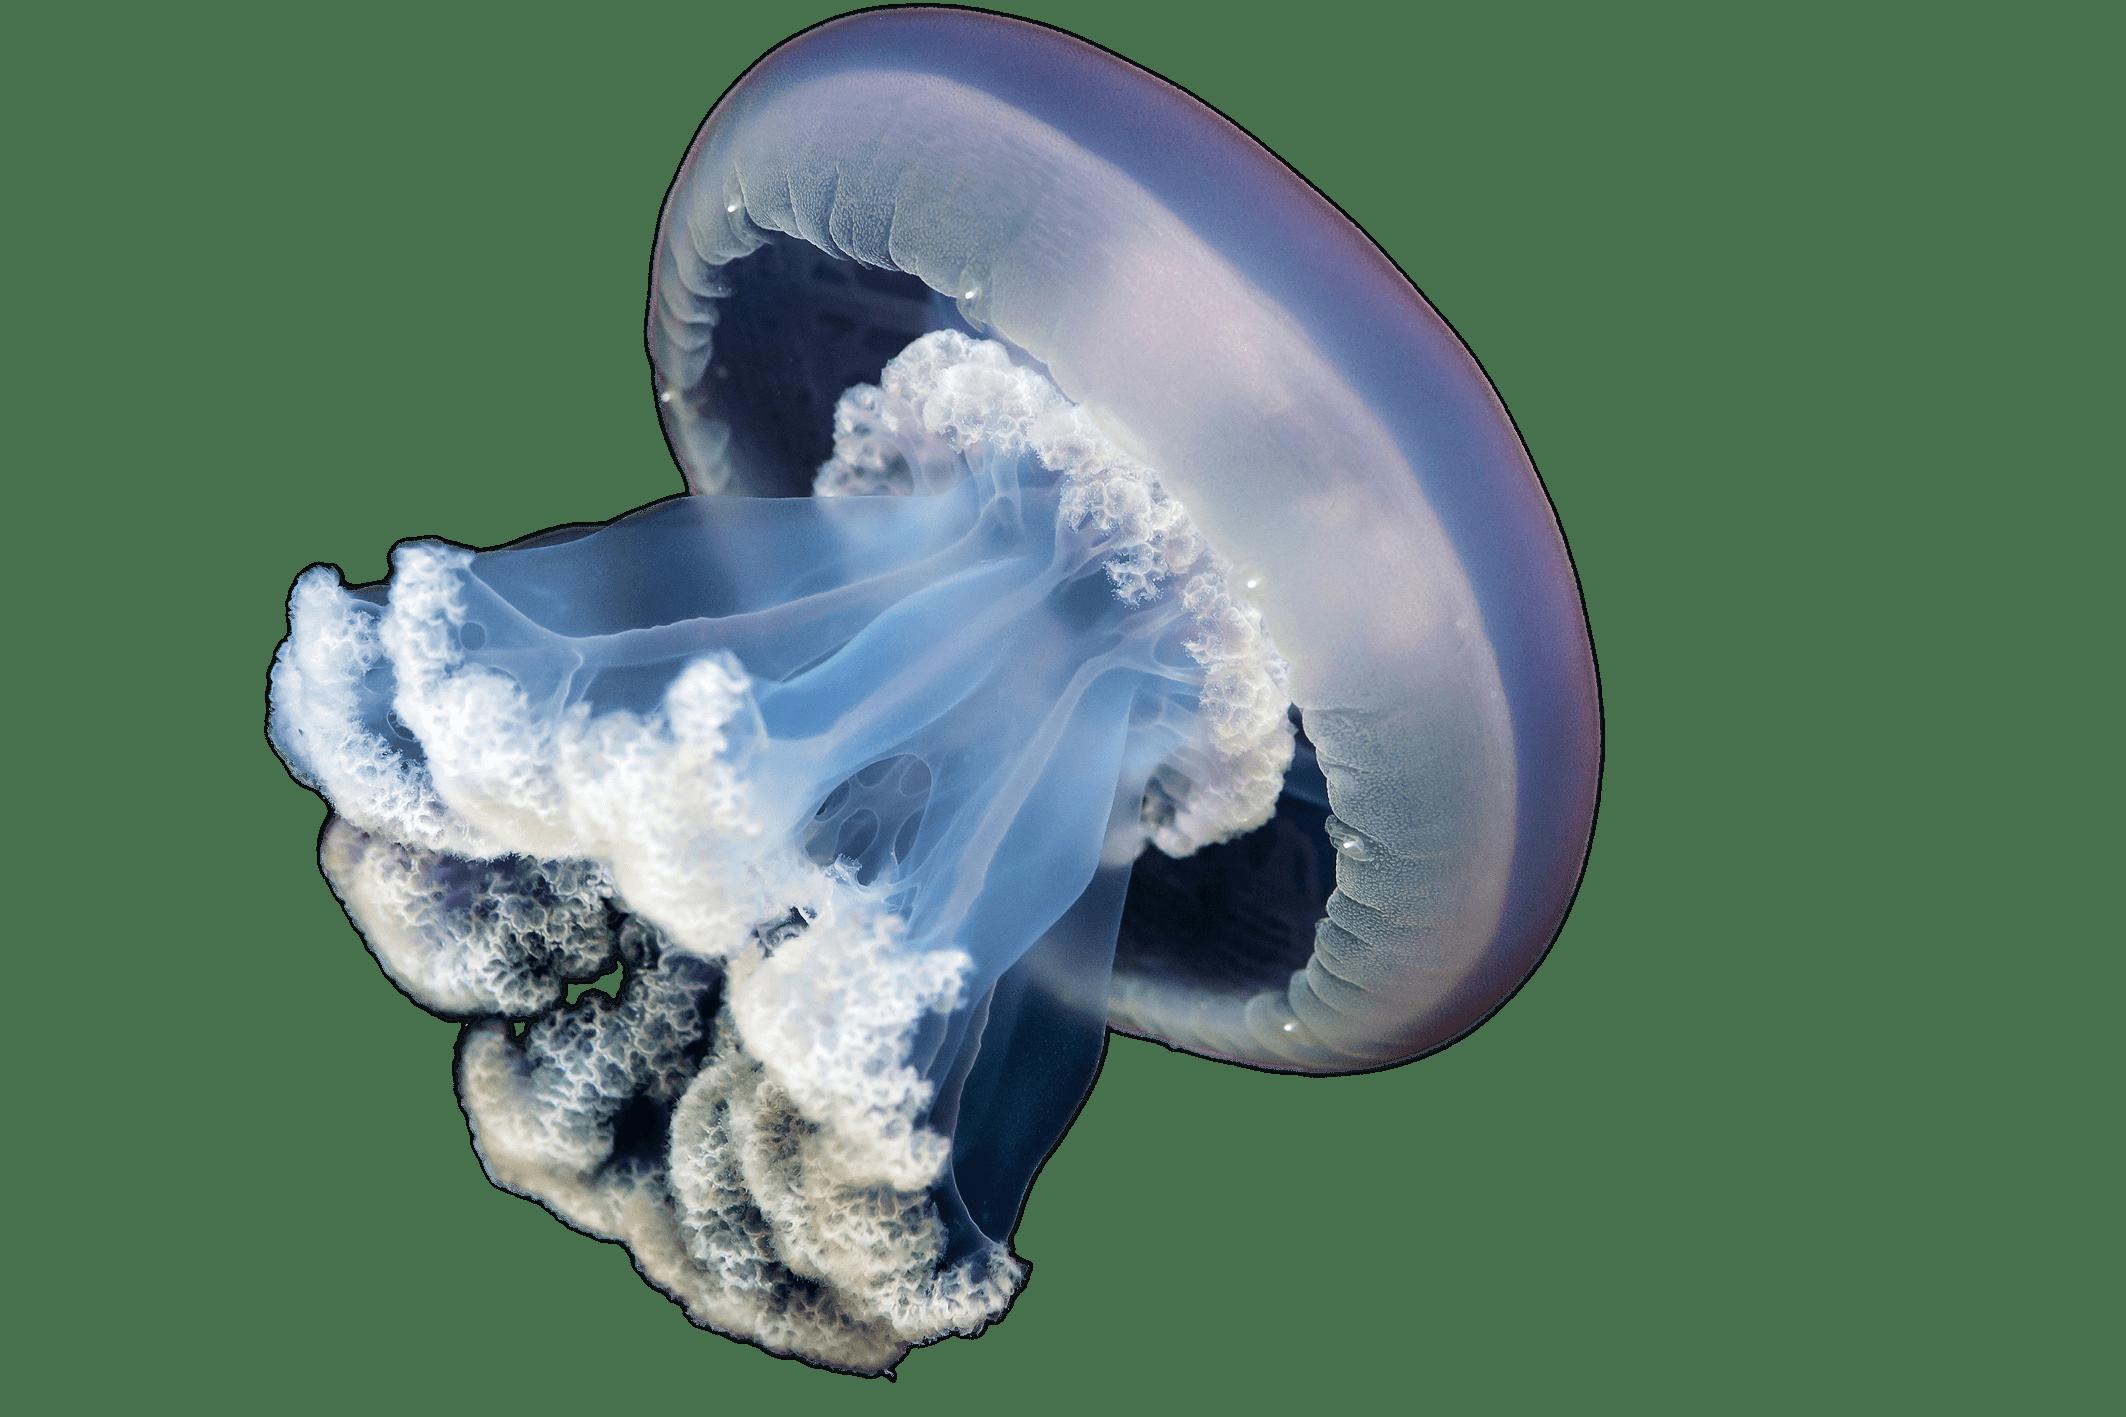 Clipart ocean jellyfish. Png